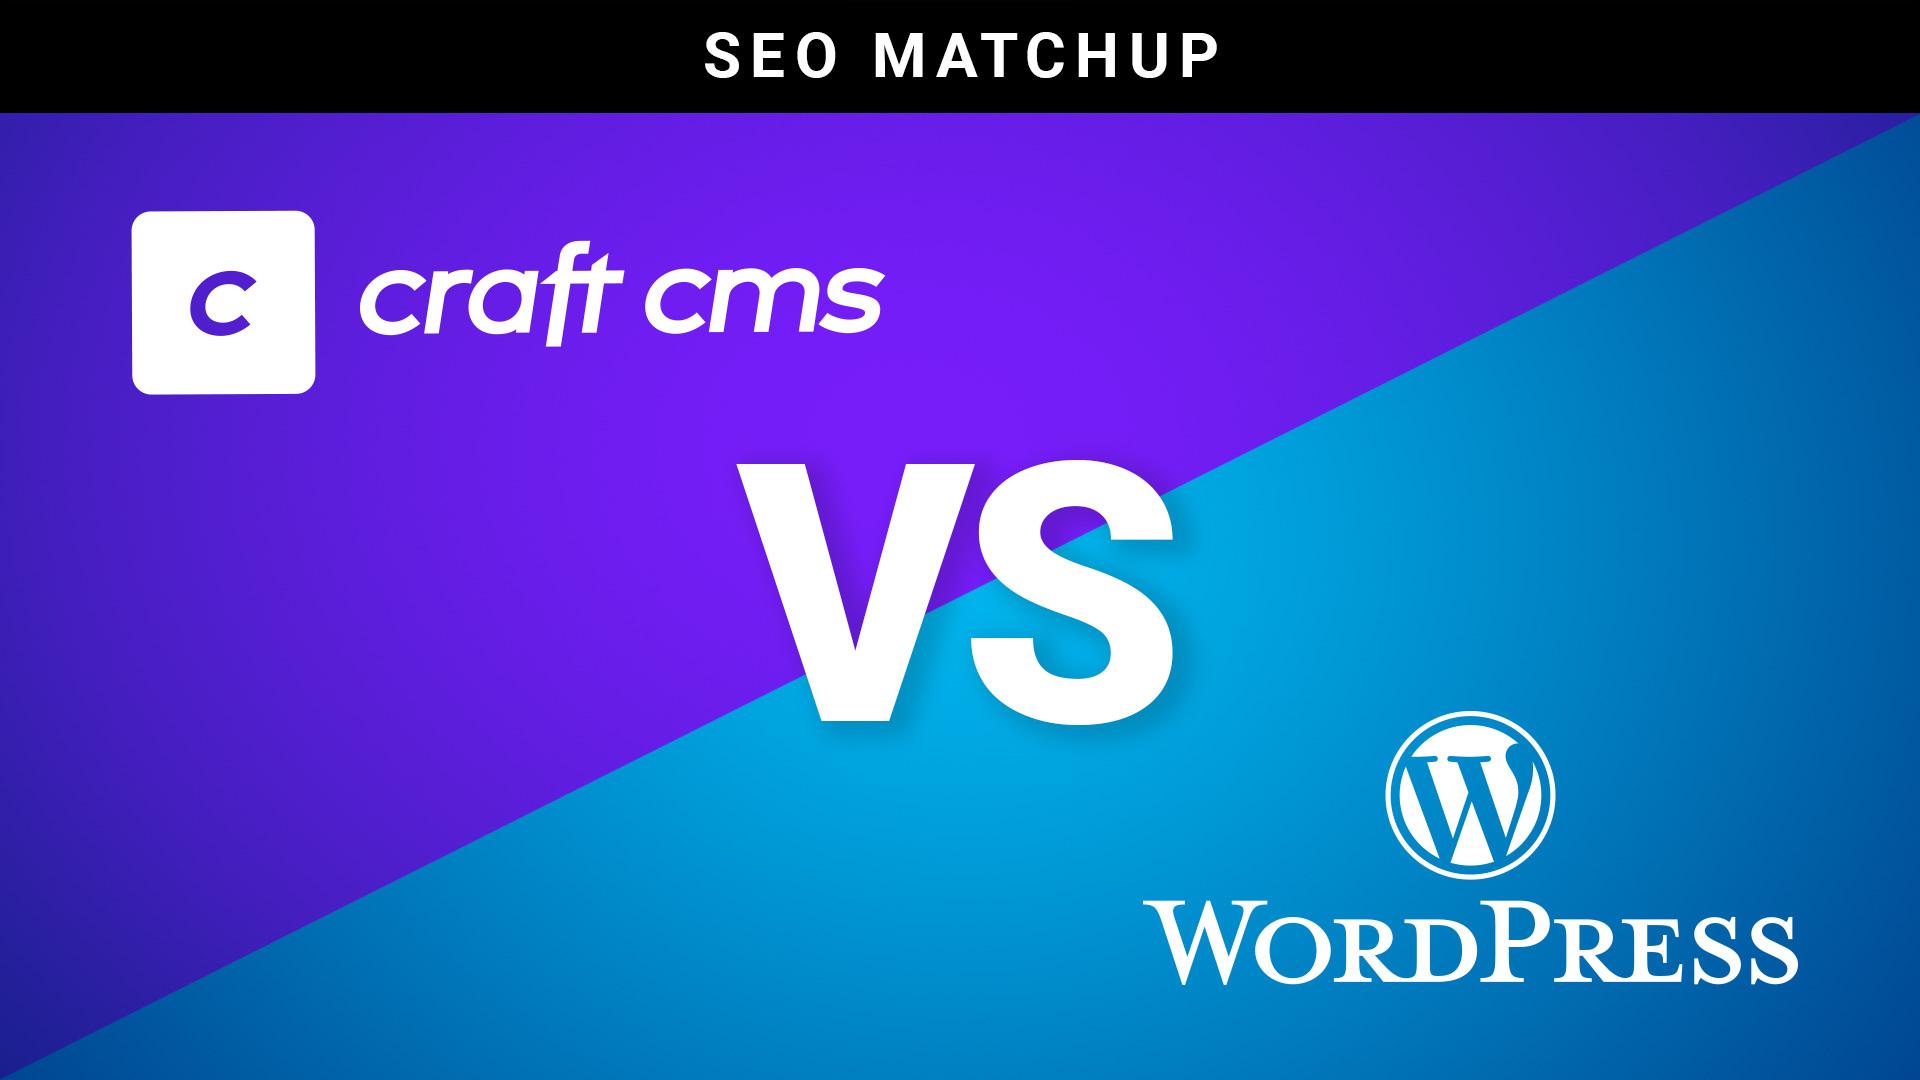 Craft CMS vs WordPress: SEO Matchup